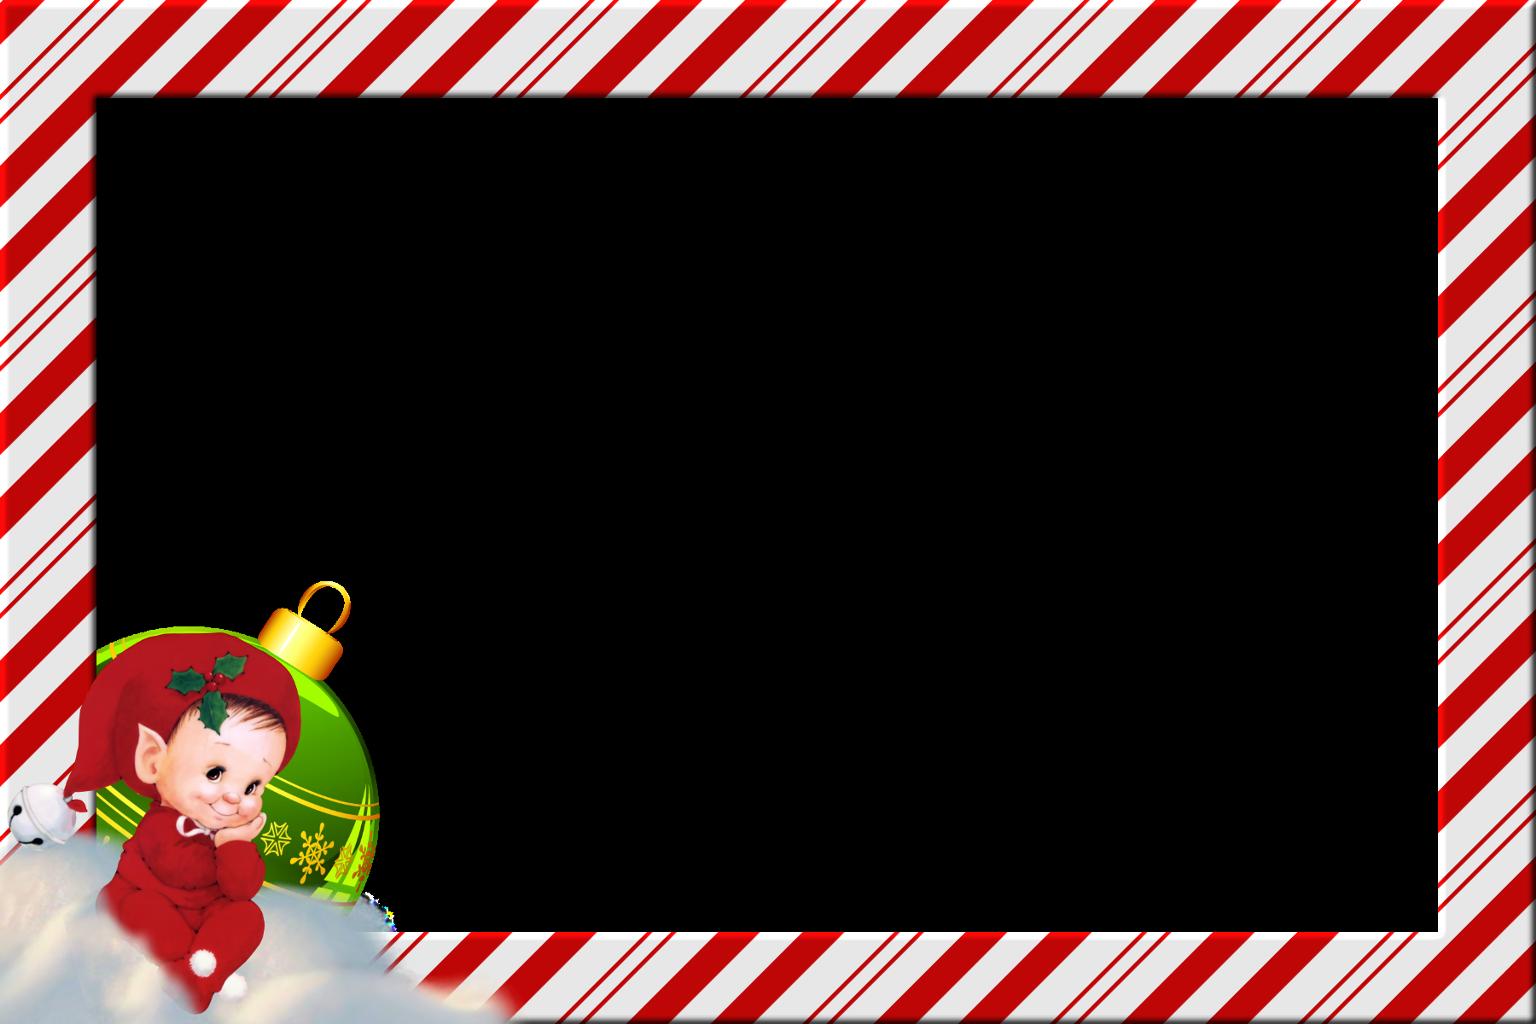 Christmas transparentbackground openindraw . Frame clipart transparent background